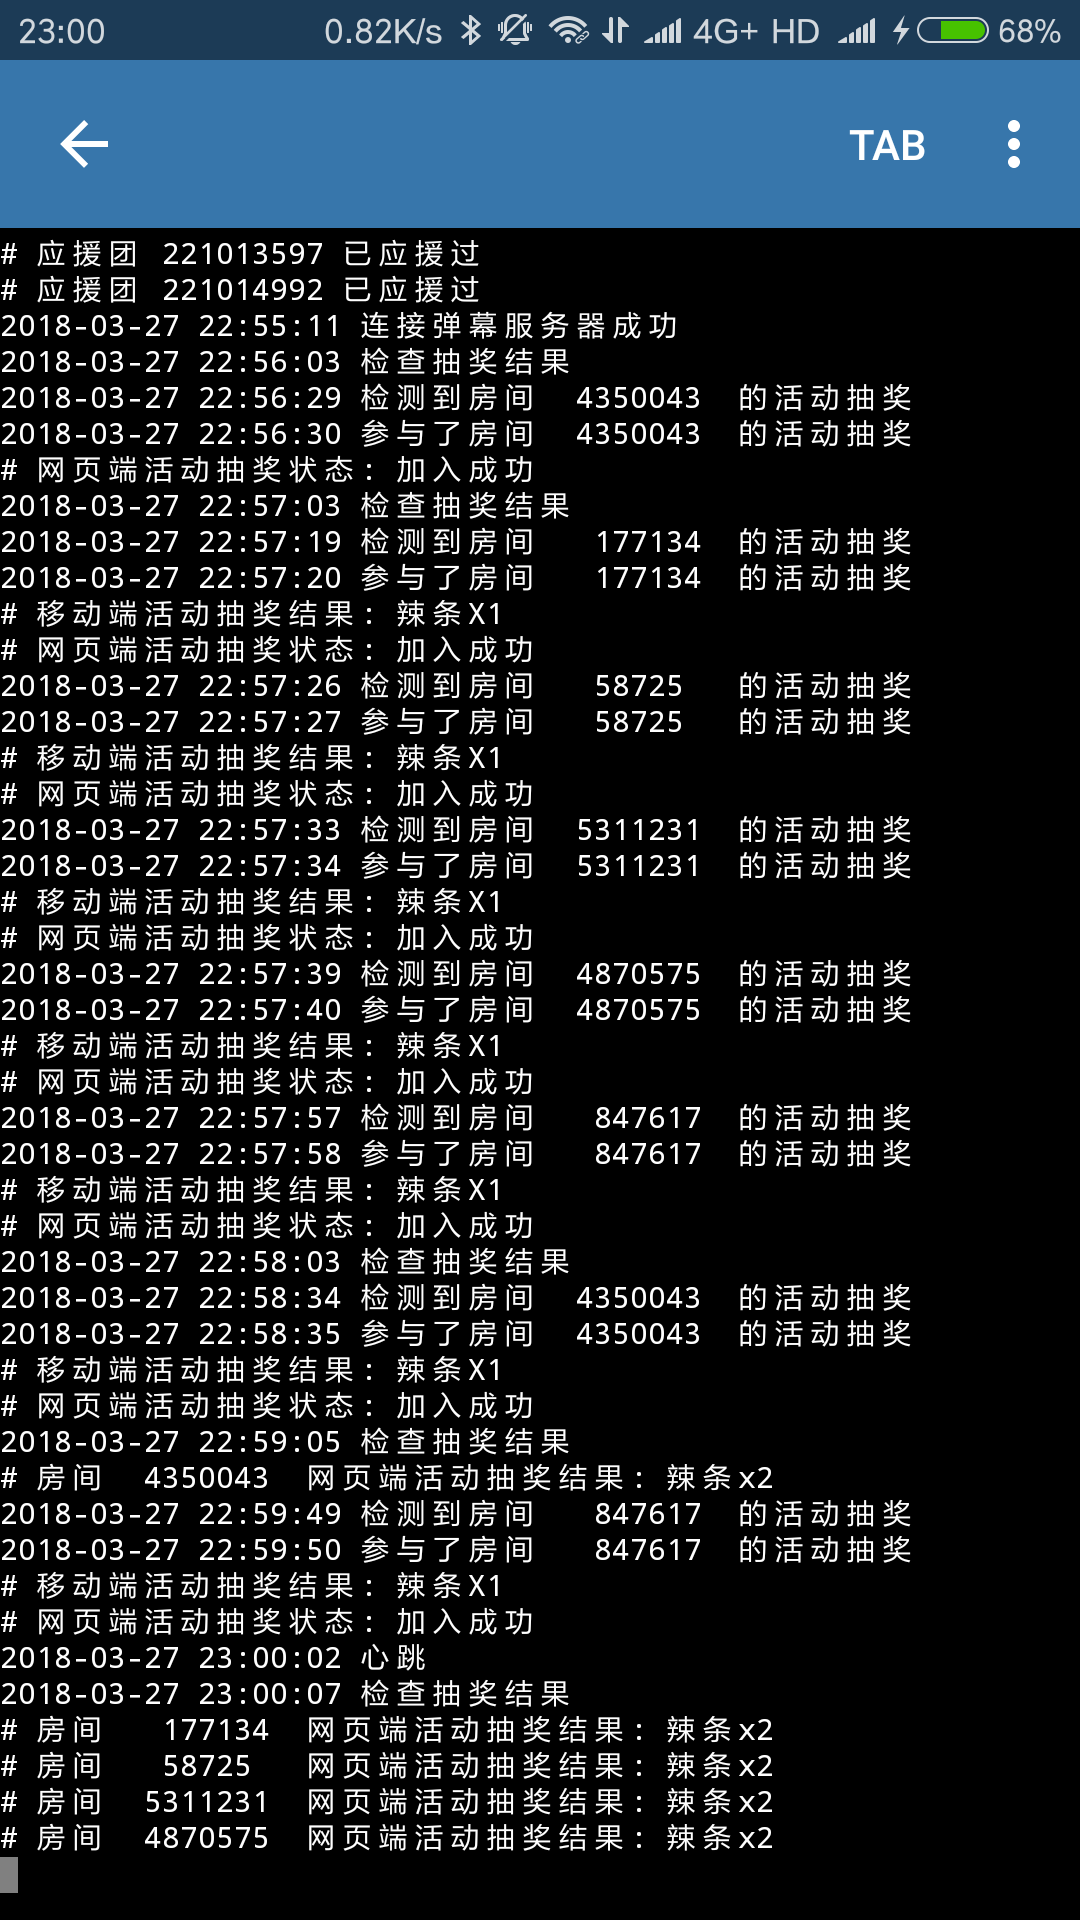 screenshot_2018-03-27-23-00-46-066_ru iiec pydroi